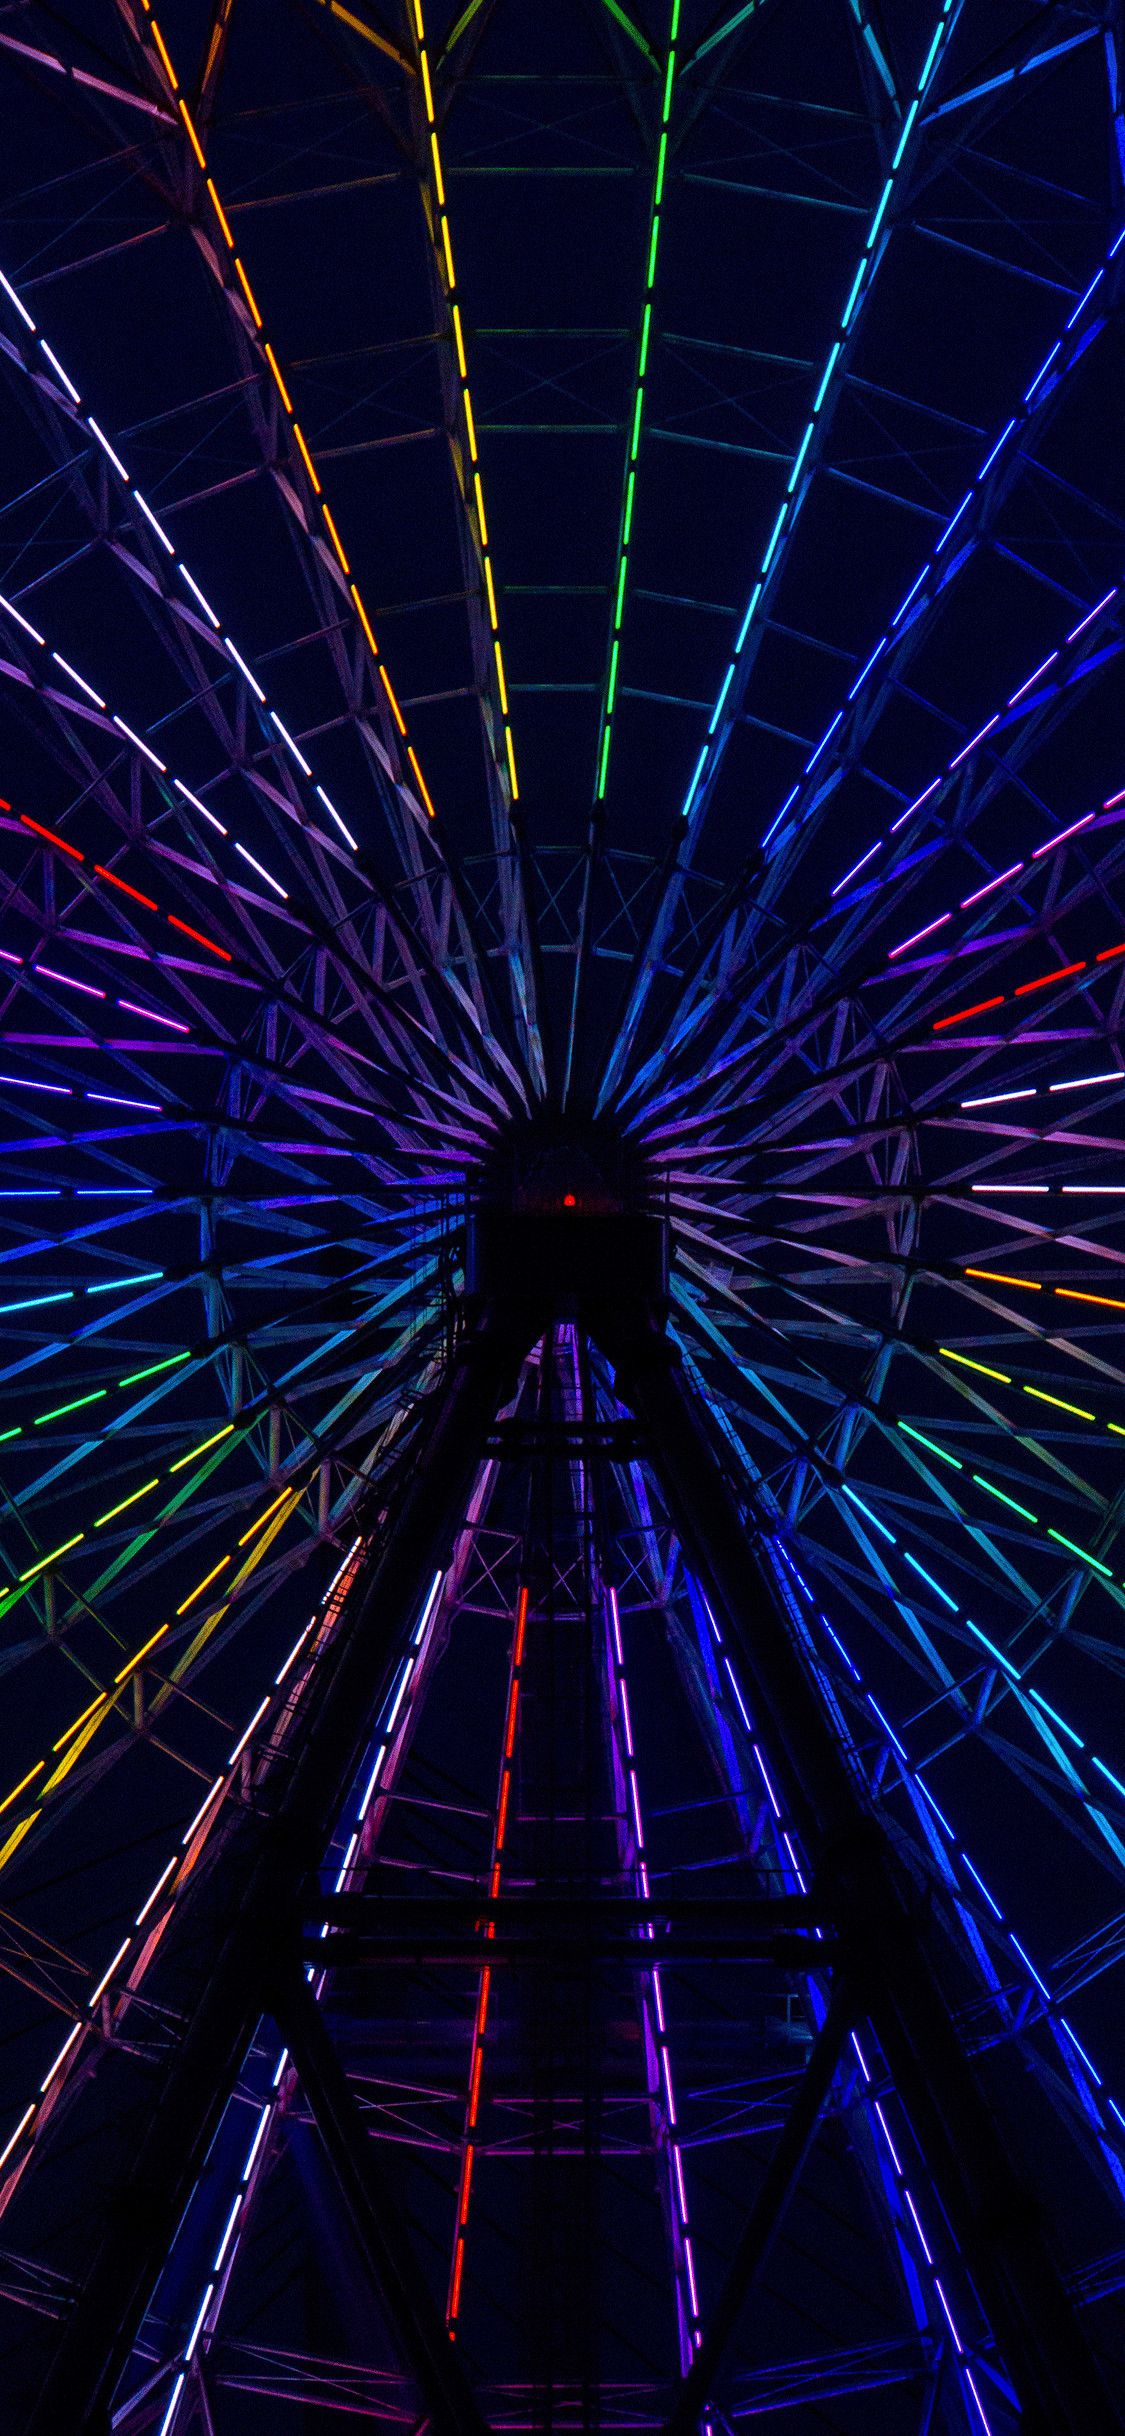 Iphone Xr Wallpaper 4k Fall Mywallpapers Site Neon Light Wallpaper Ferris Wheel Rainbow Pictures